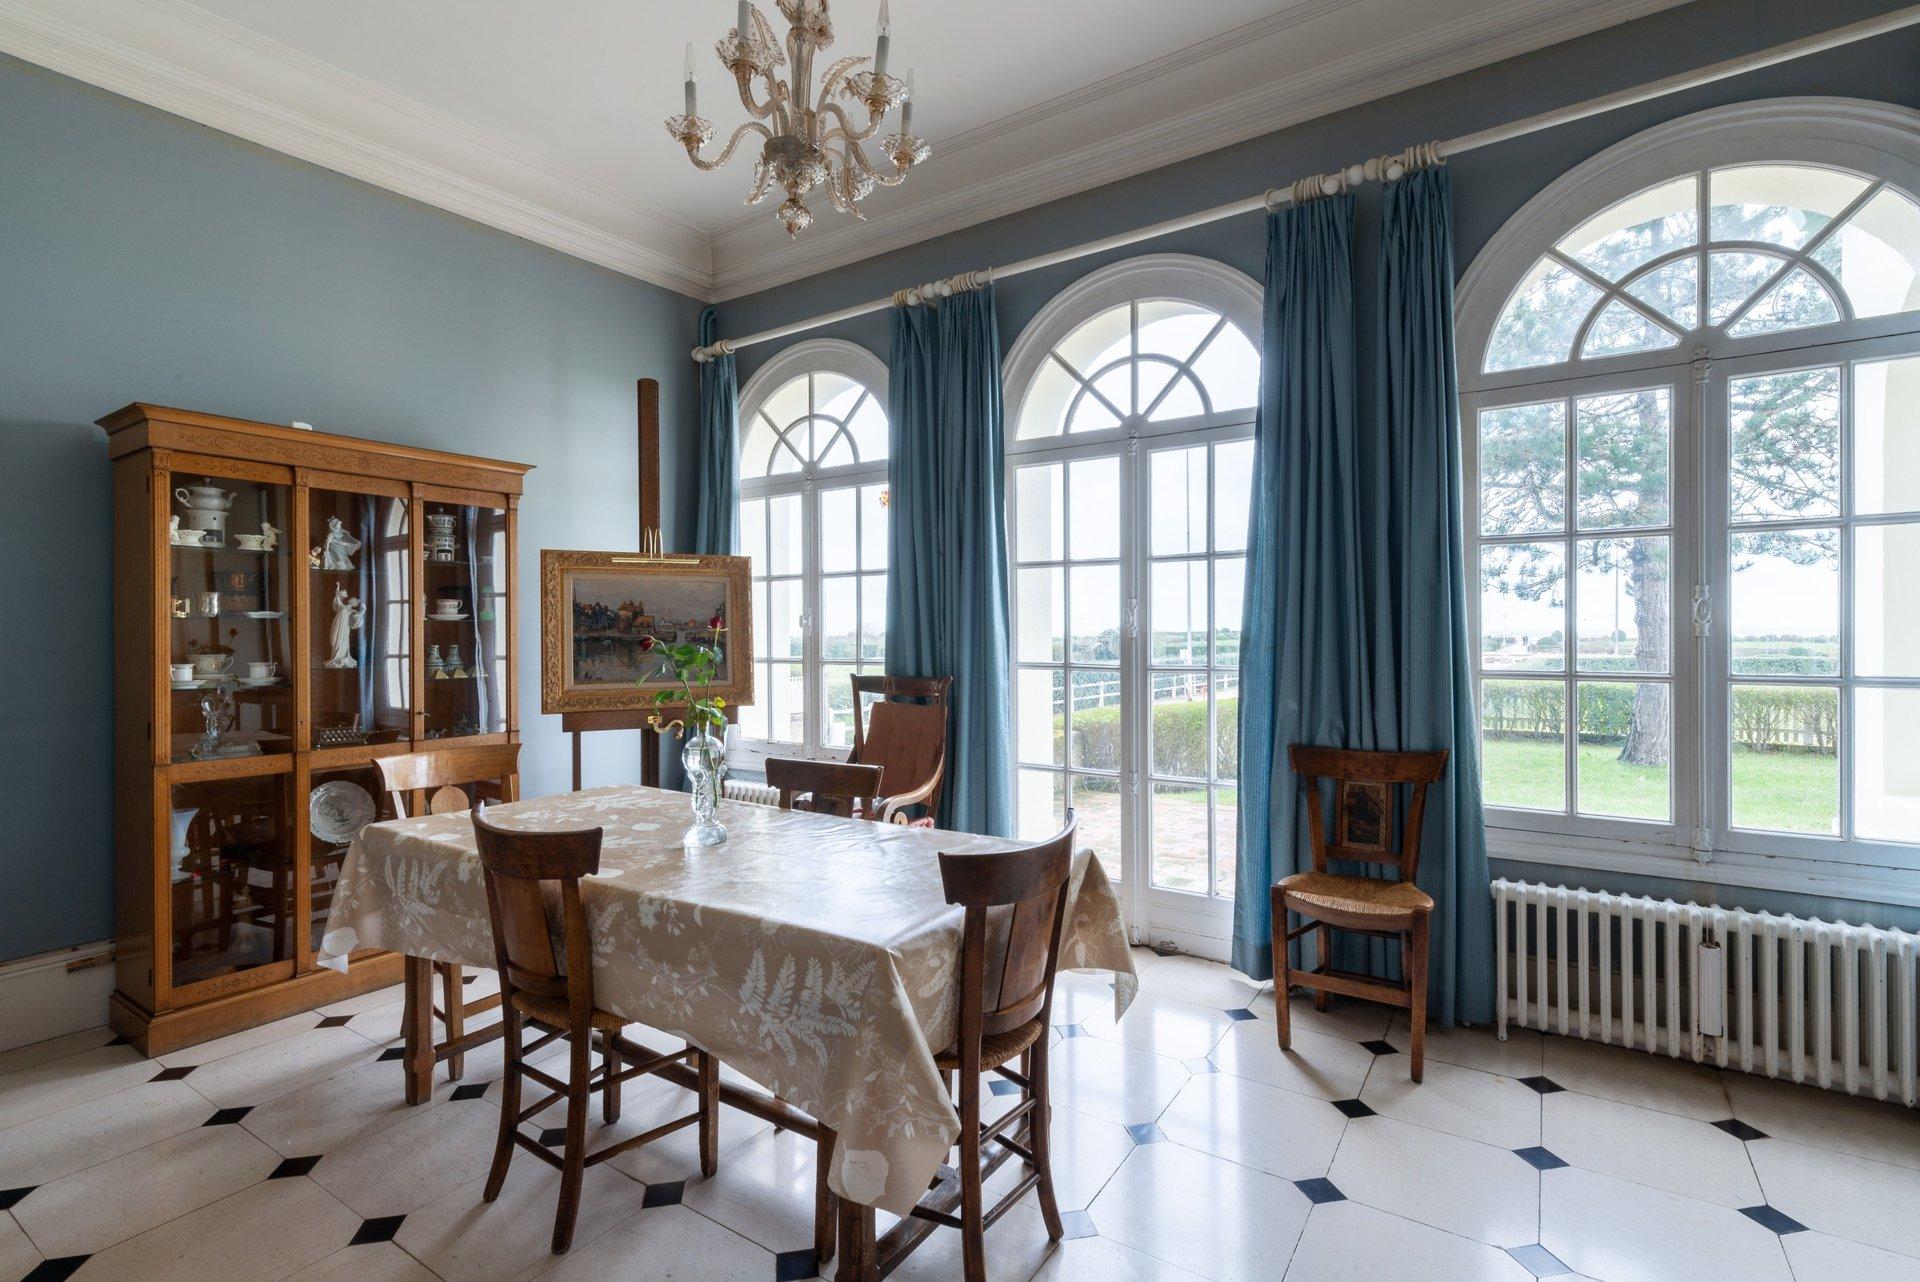 exceptional-villa-for-sale-character-time-sea-view-balcony-mezzanine